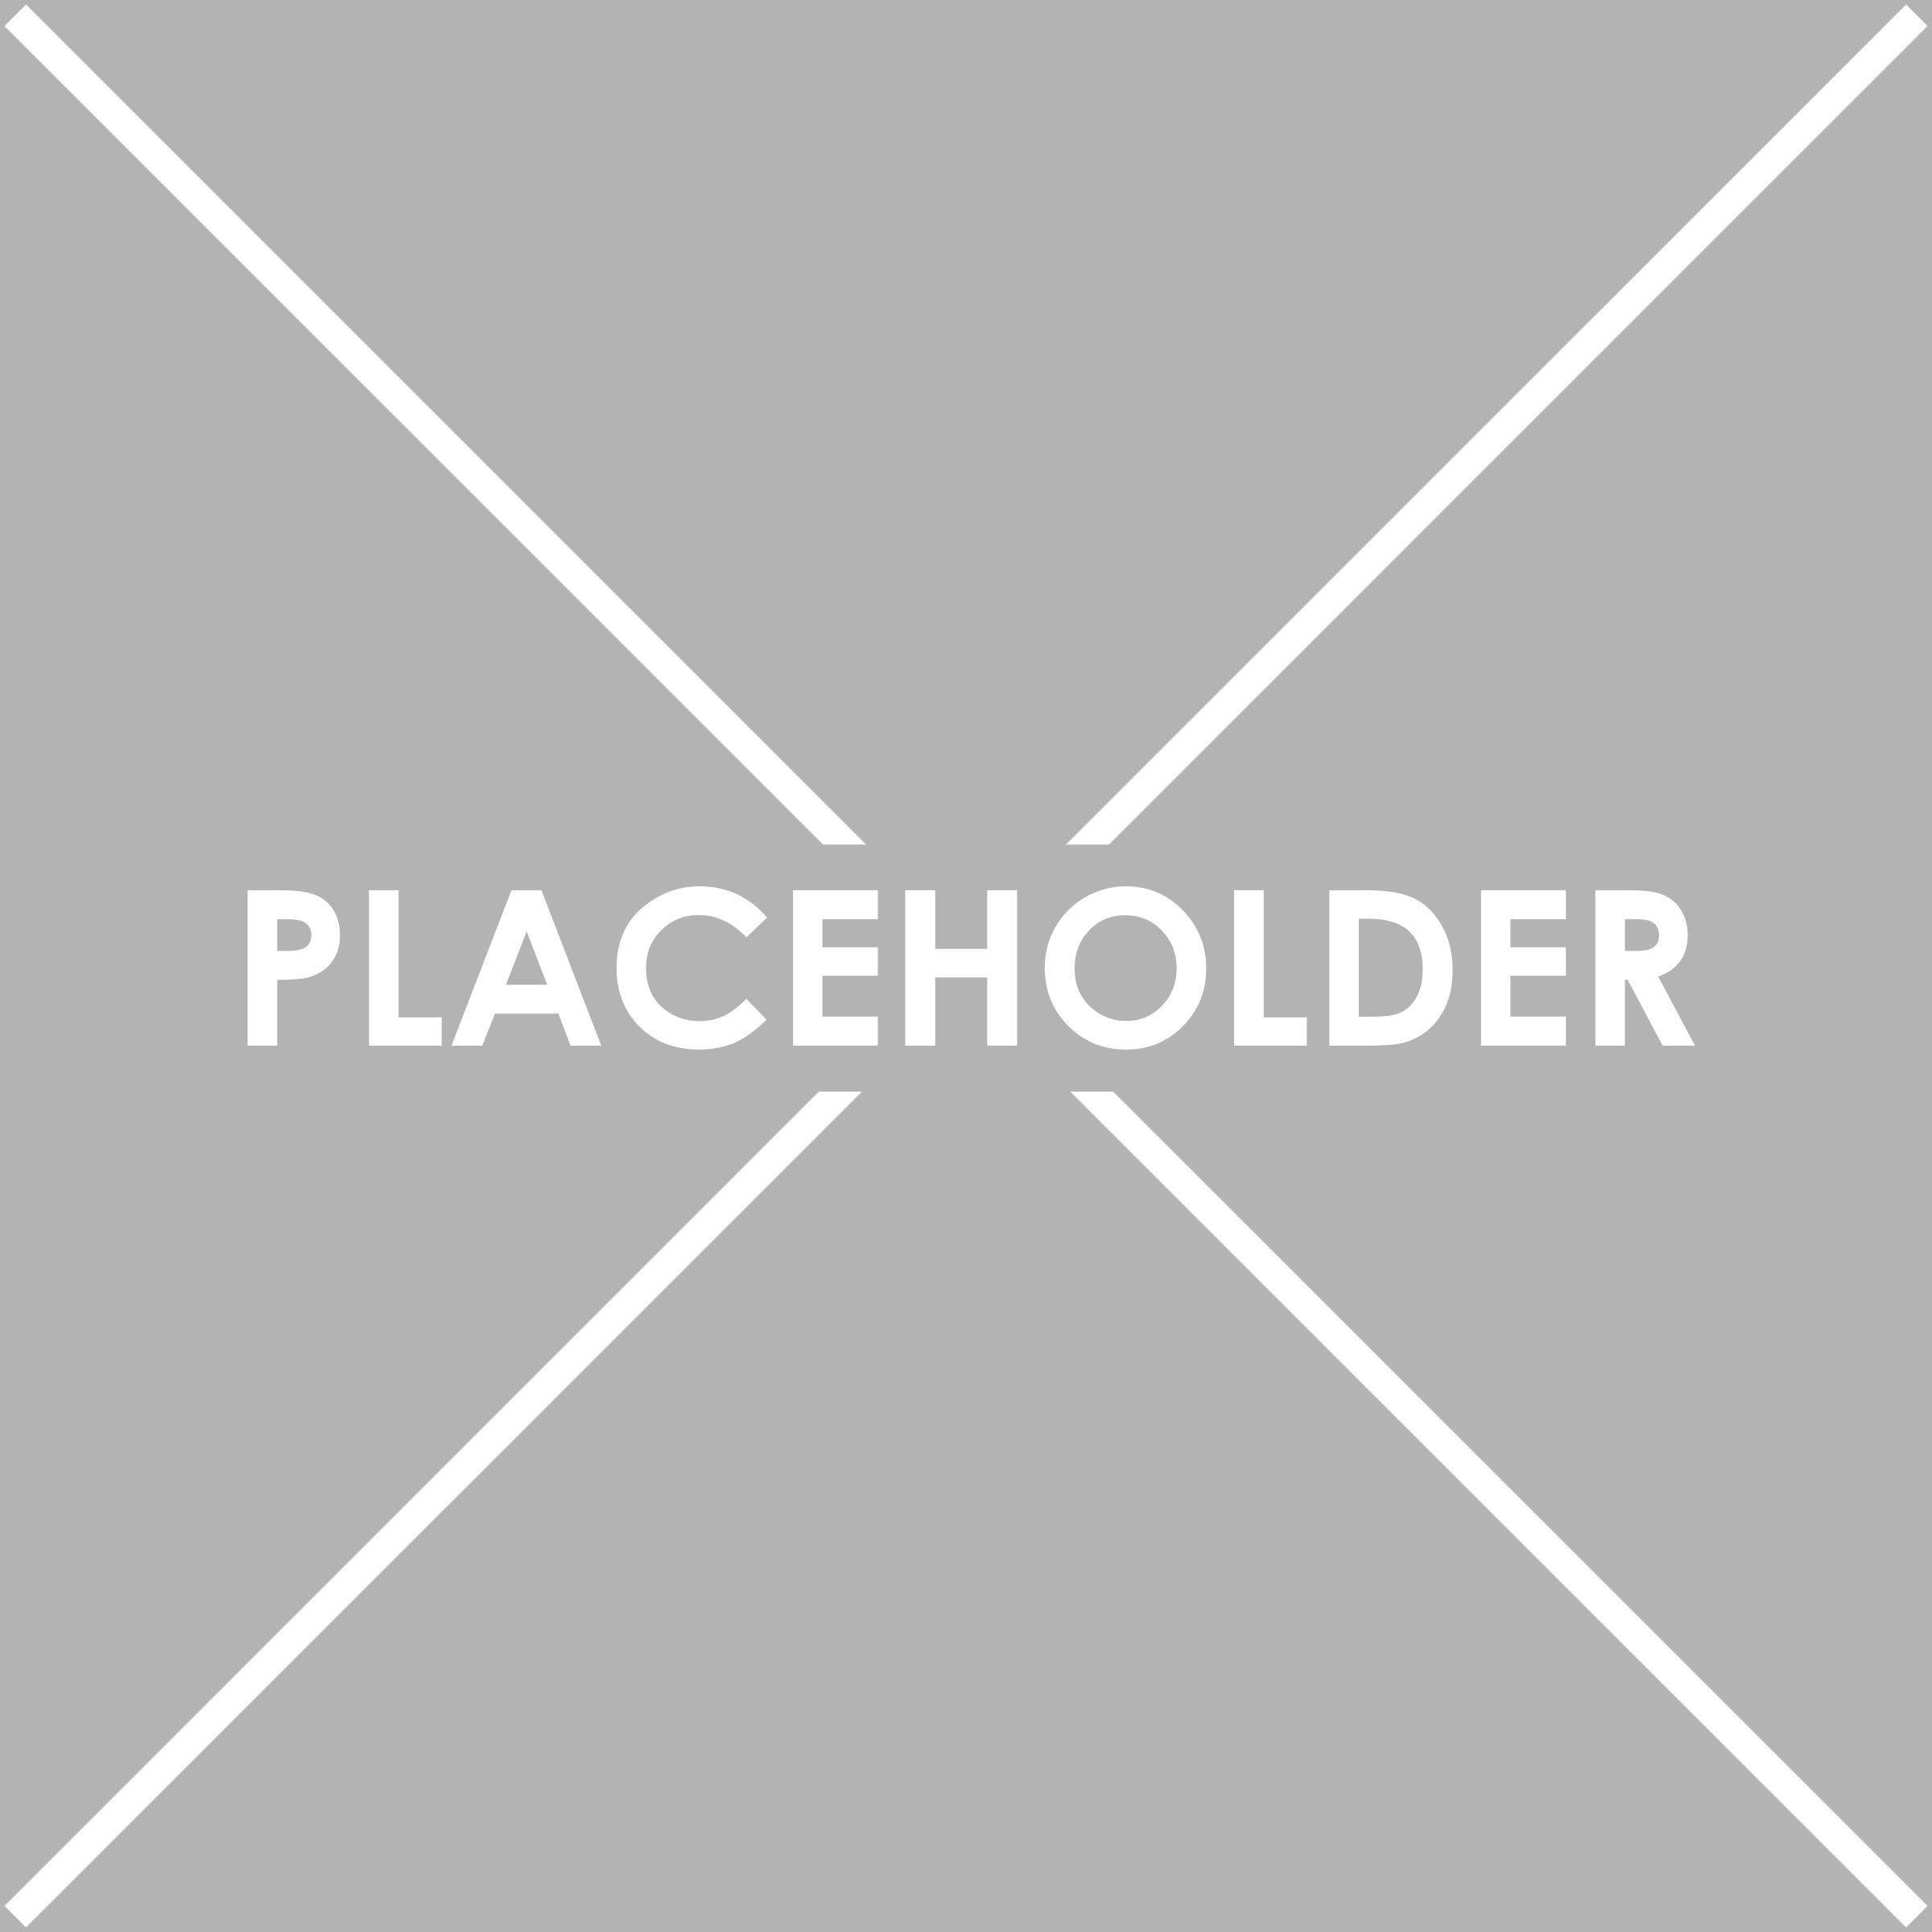 Placeholder copy.png